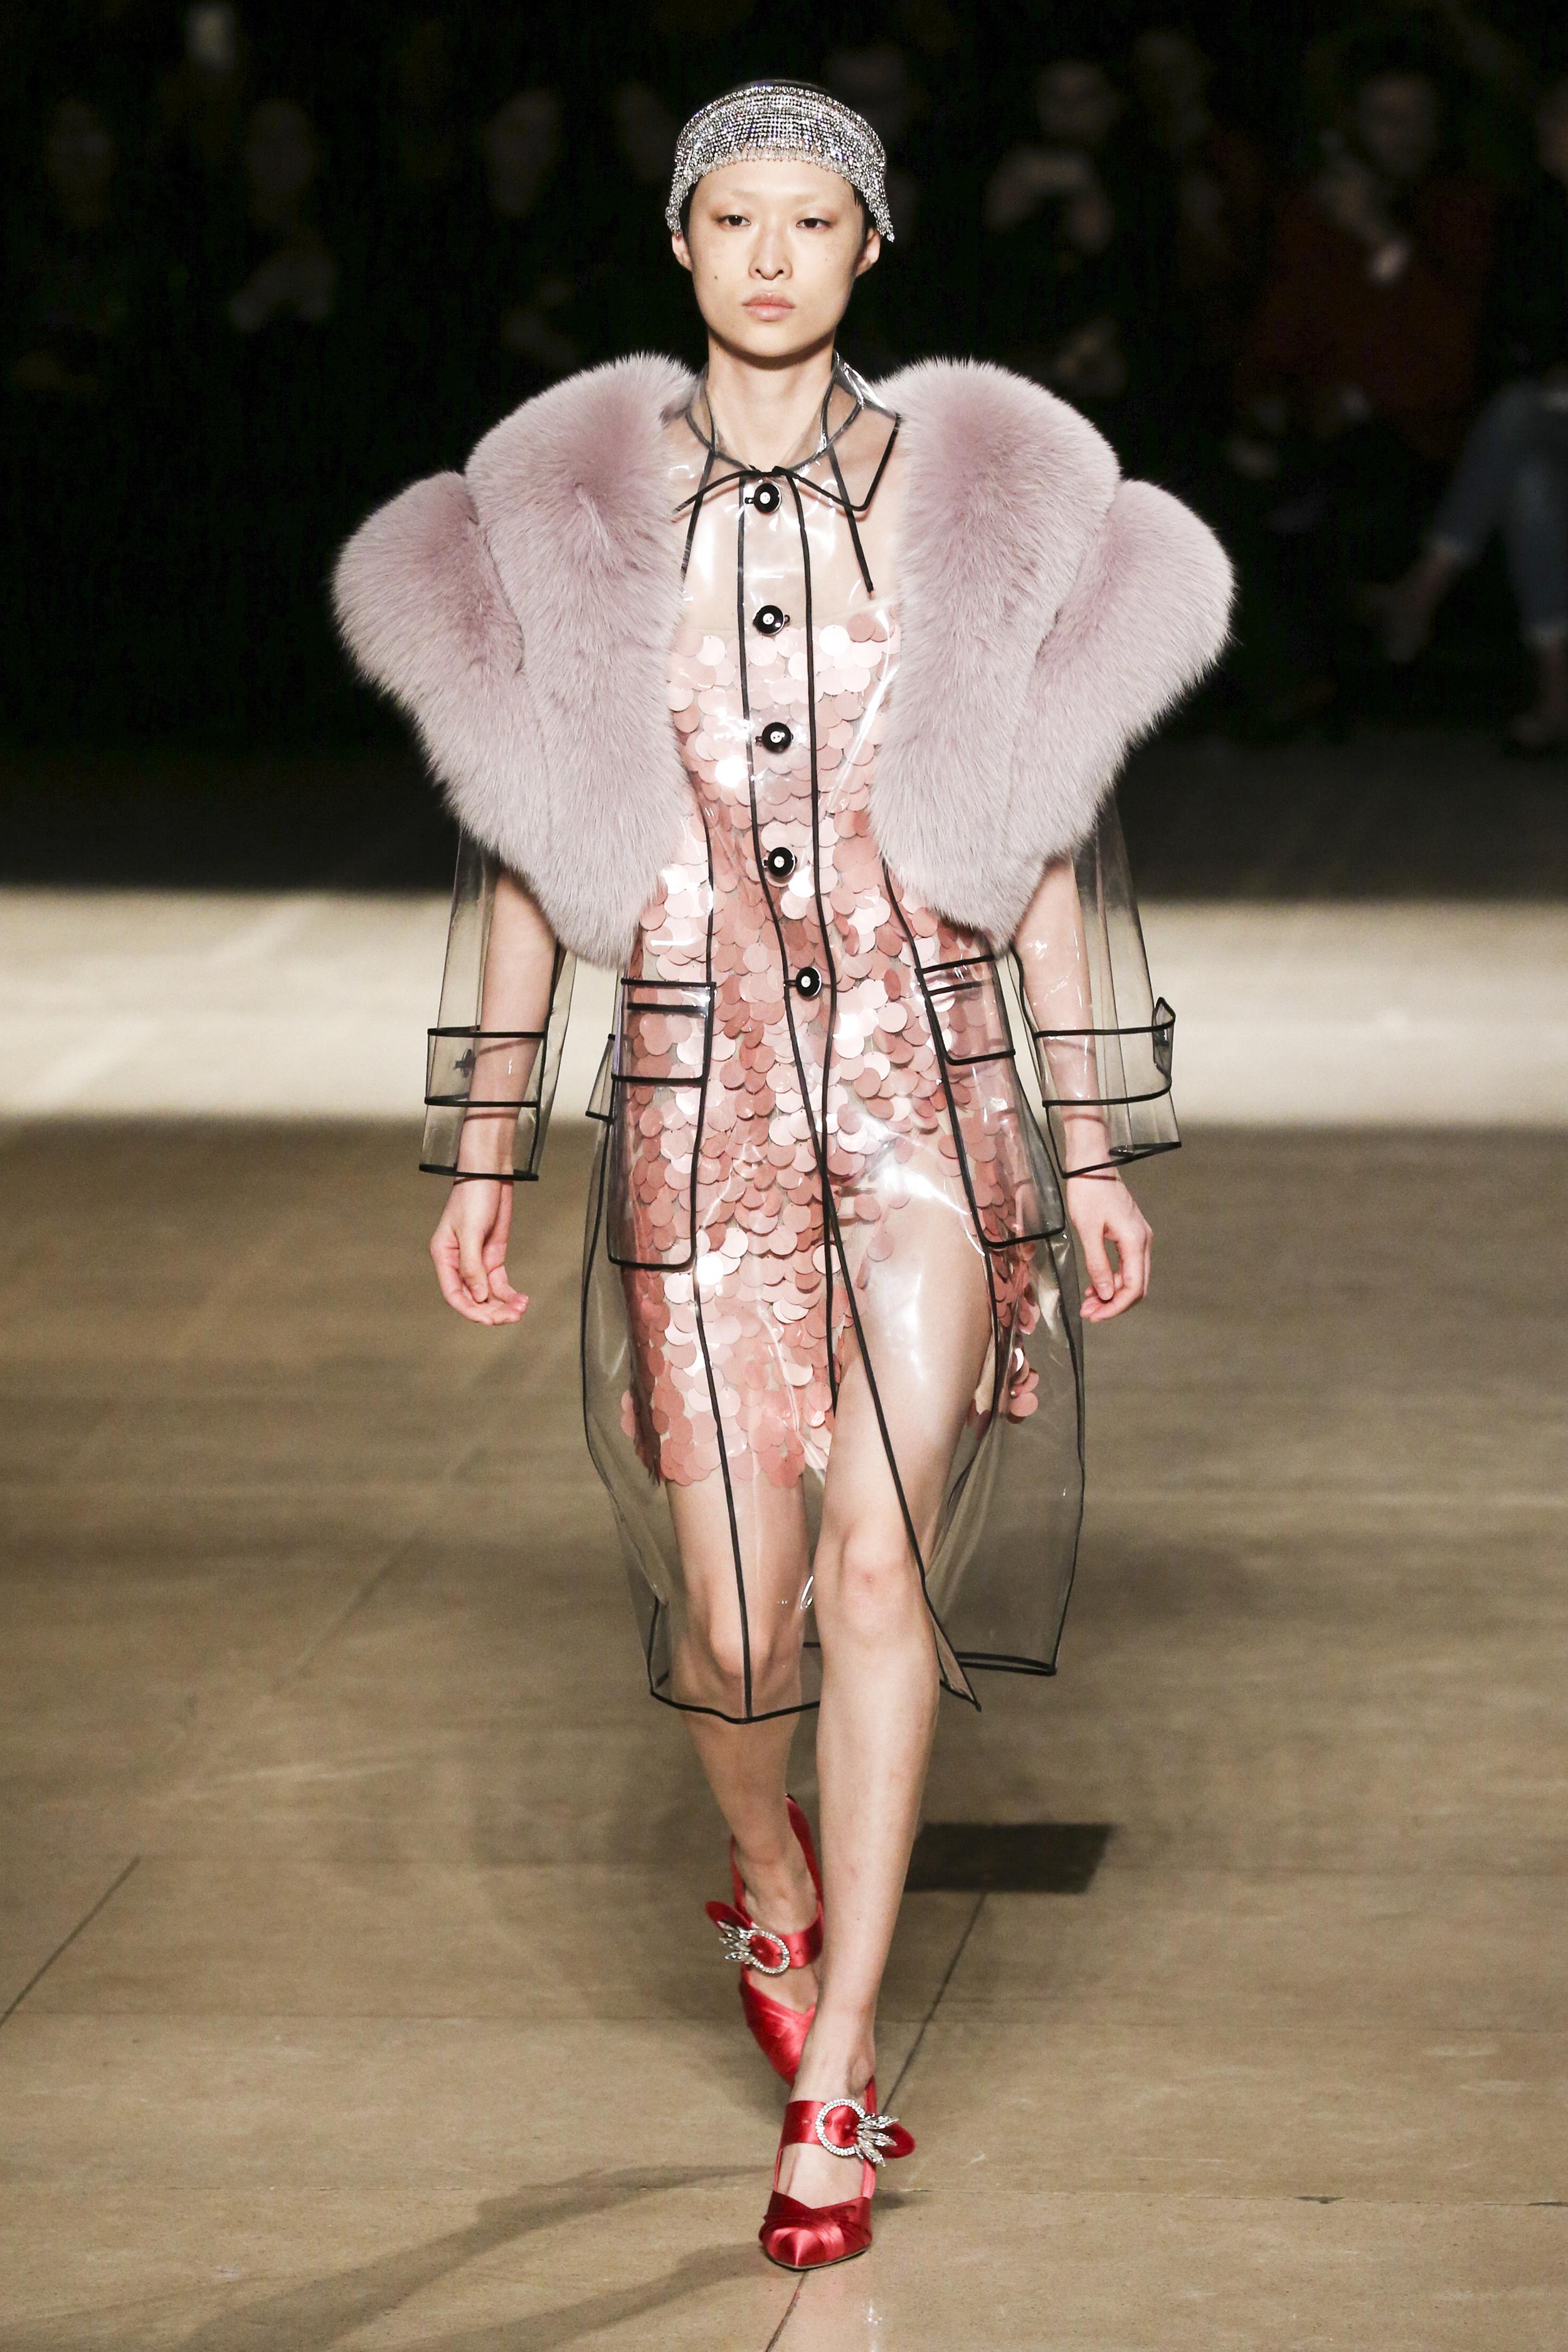 Paris Fashion Week Fall 2017: Transparente Regenjacke von Miu Miu